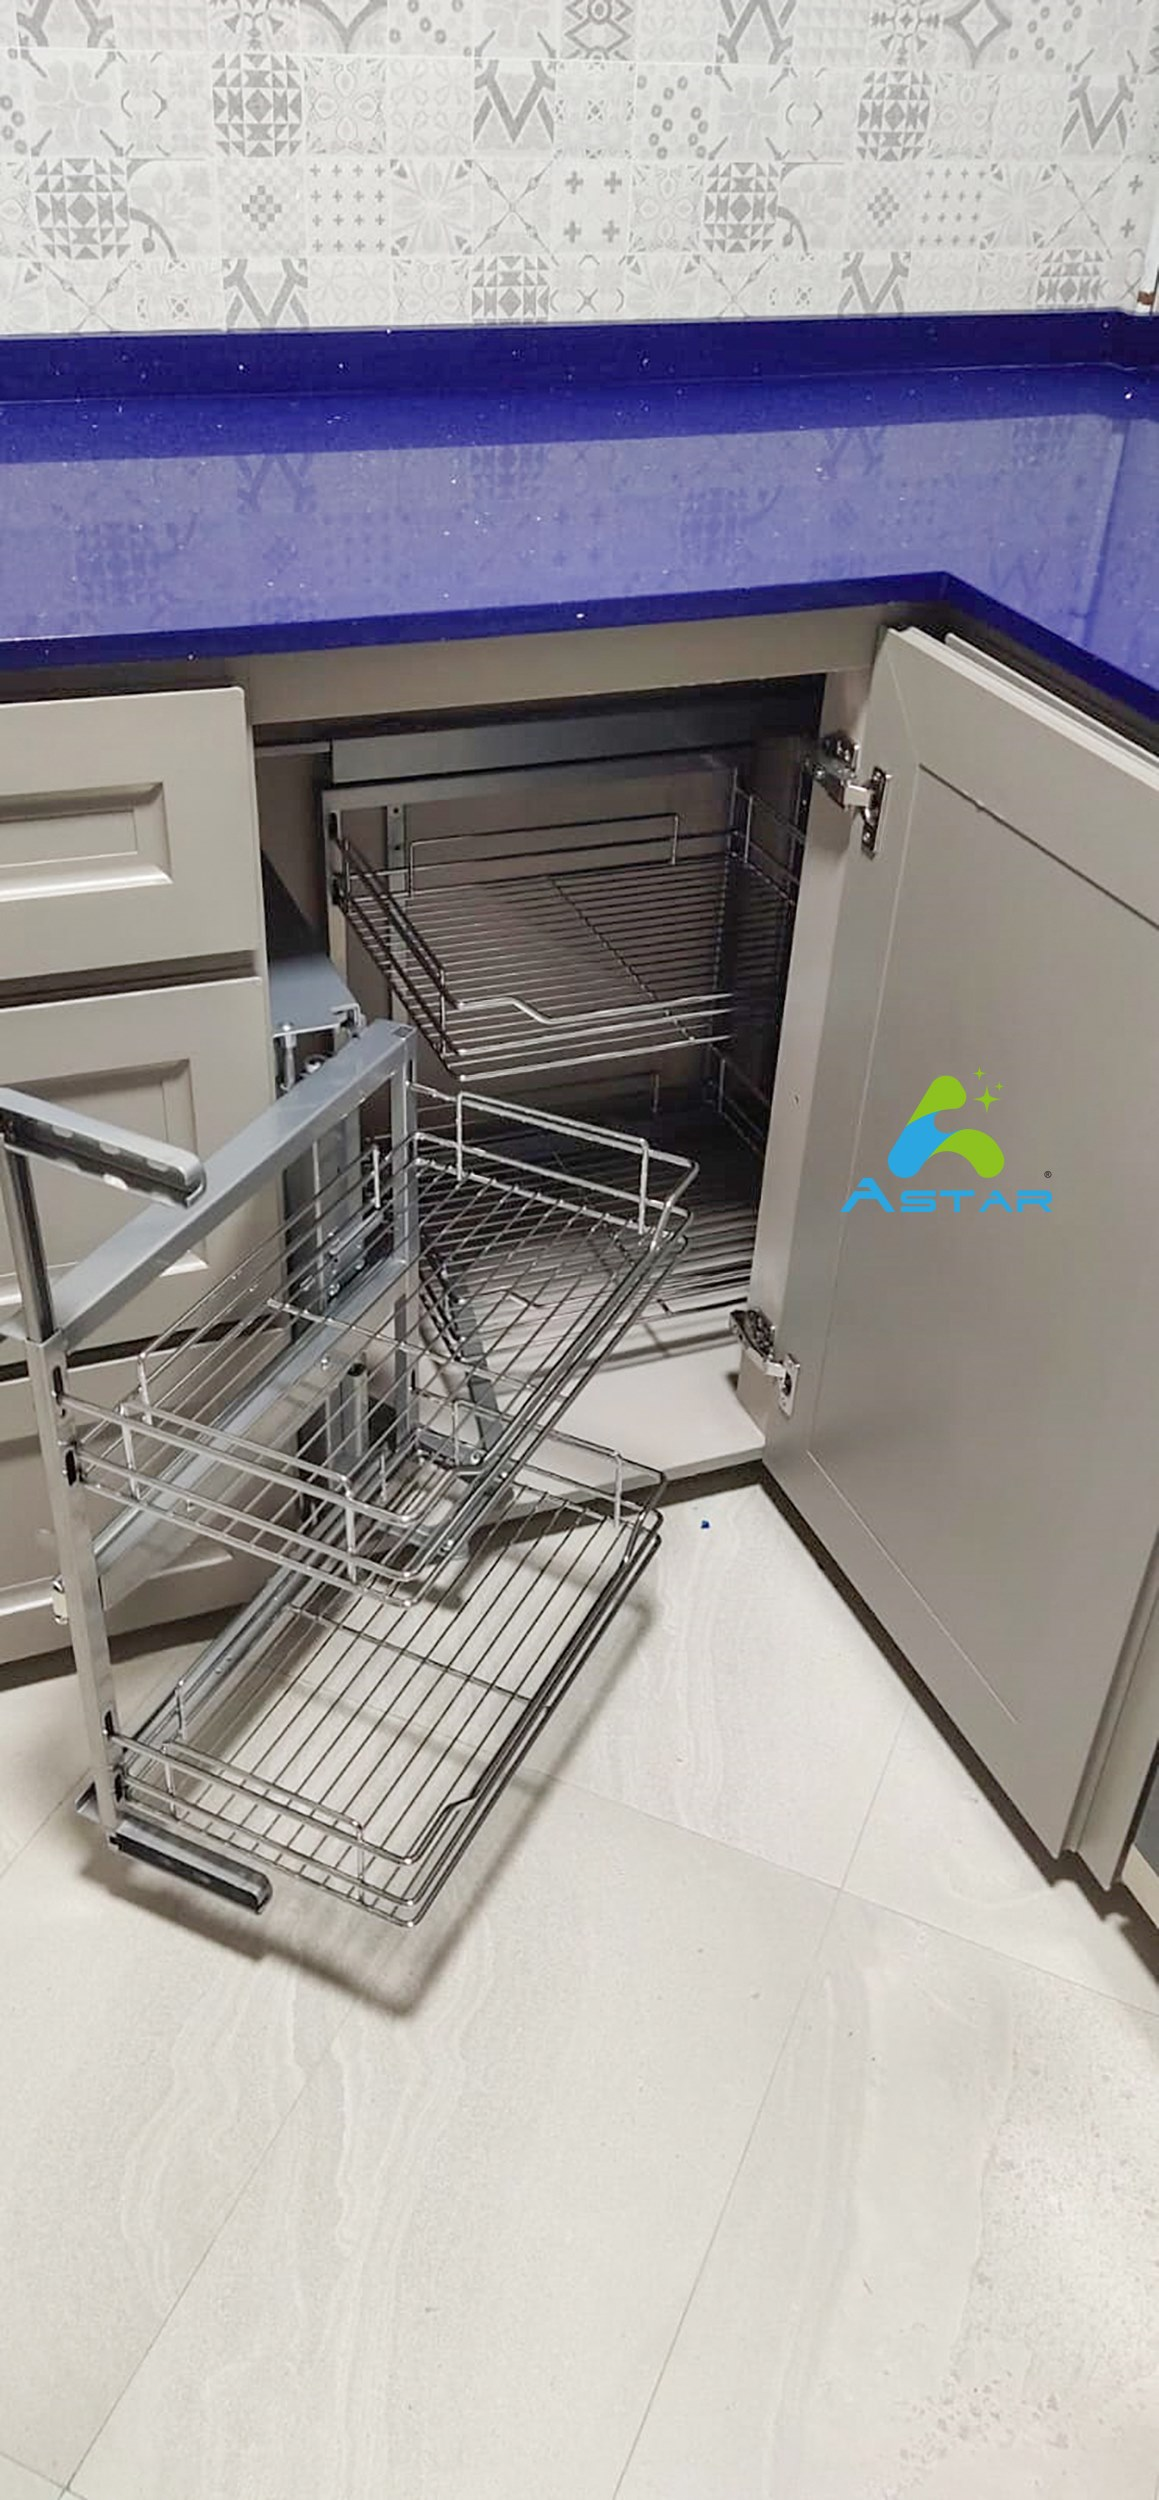 astar furnishing complete projects aluminium kitchen cabinet vanity cabinet wardrobe 109B Depot Road 5